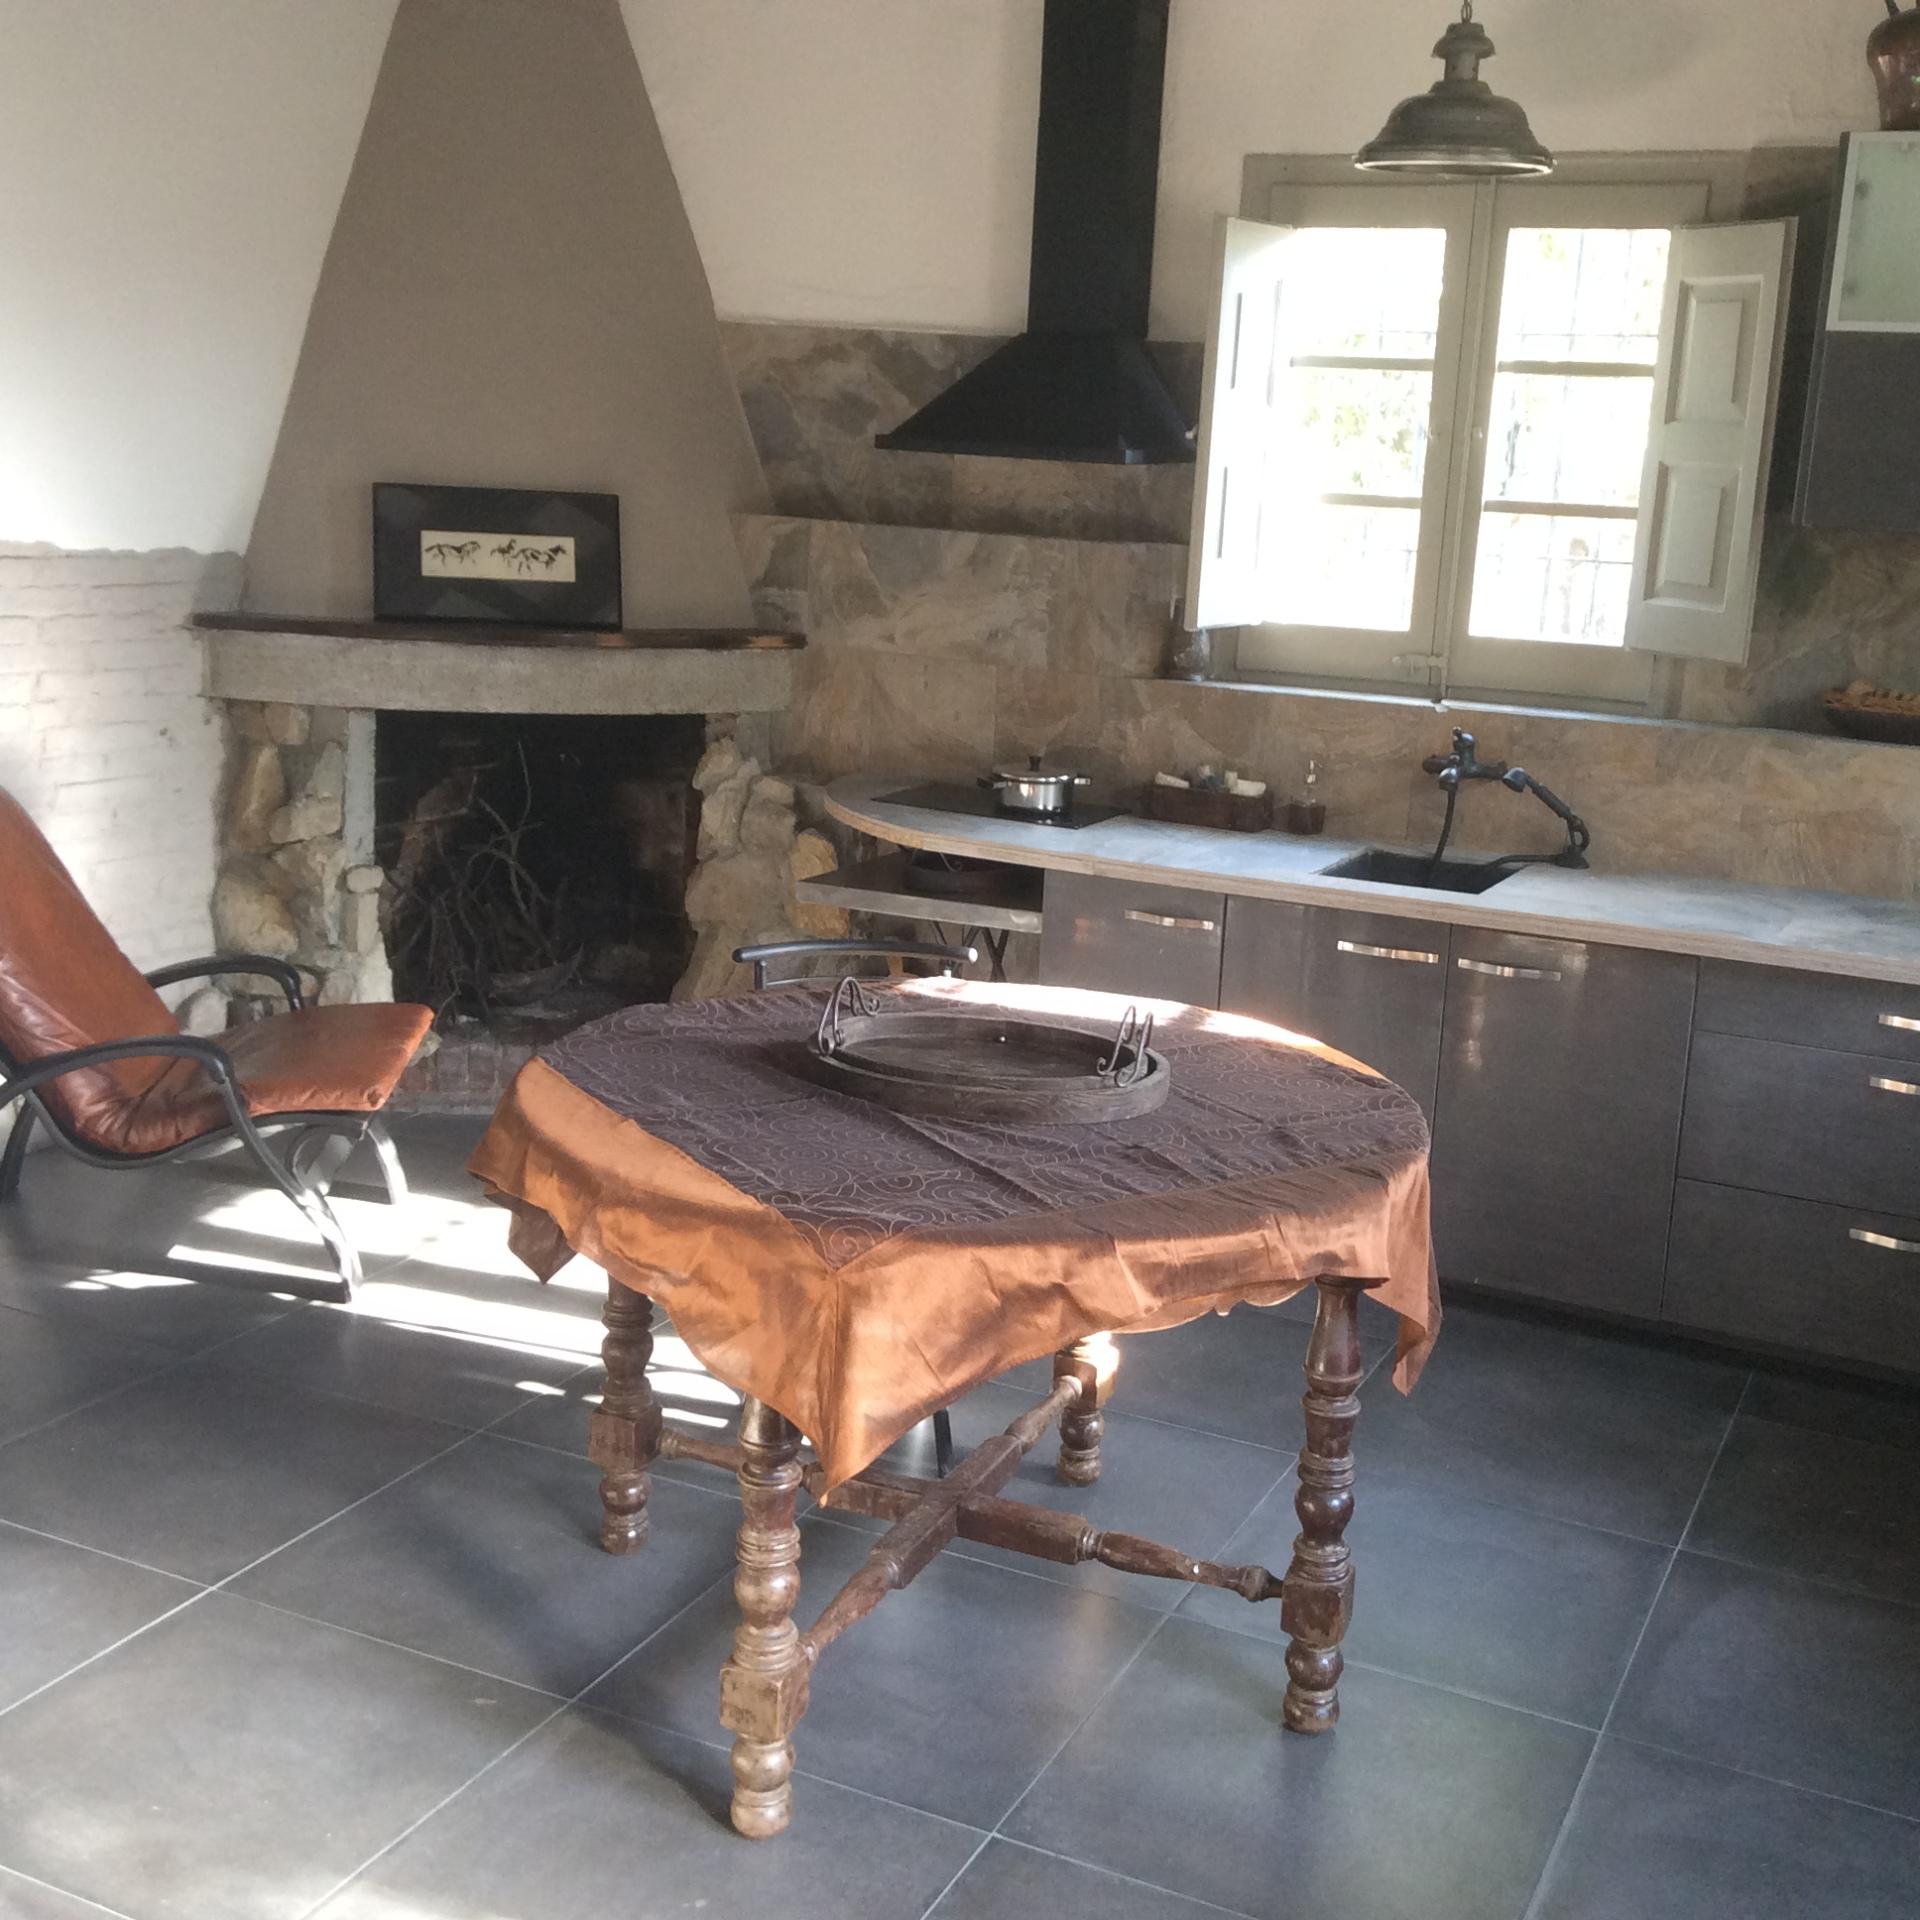 interior design art Barcelona kitchen B&B house rental art spain art consulting